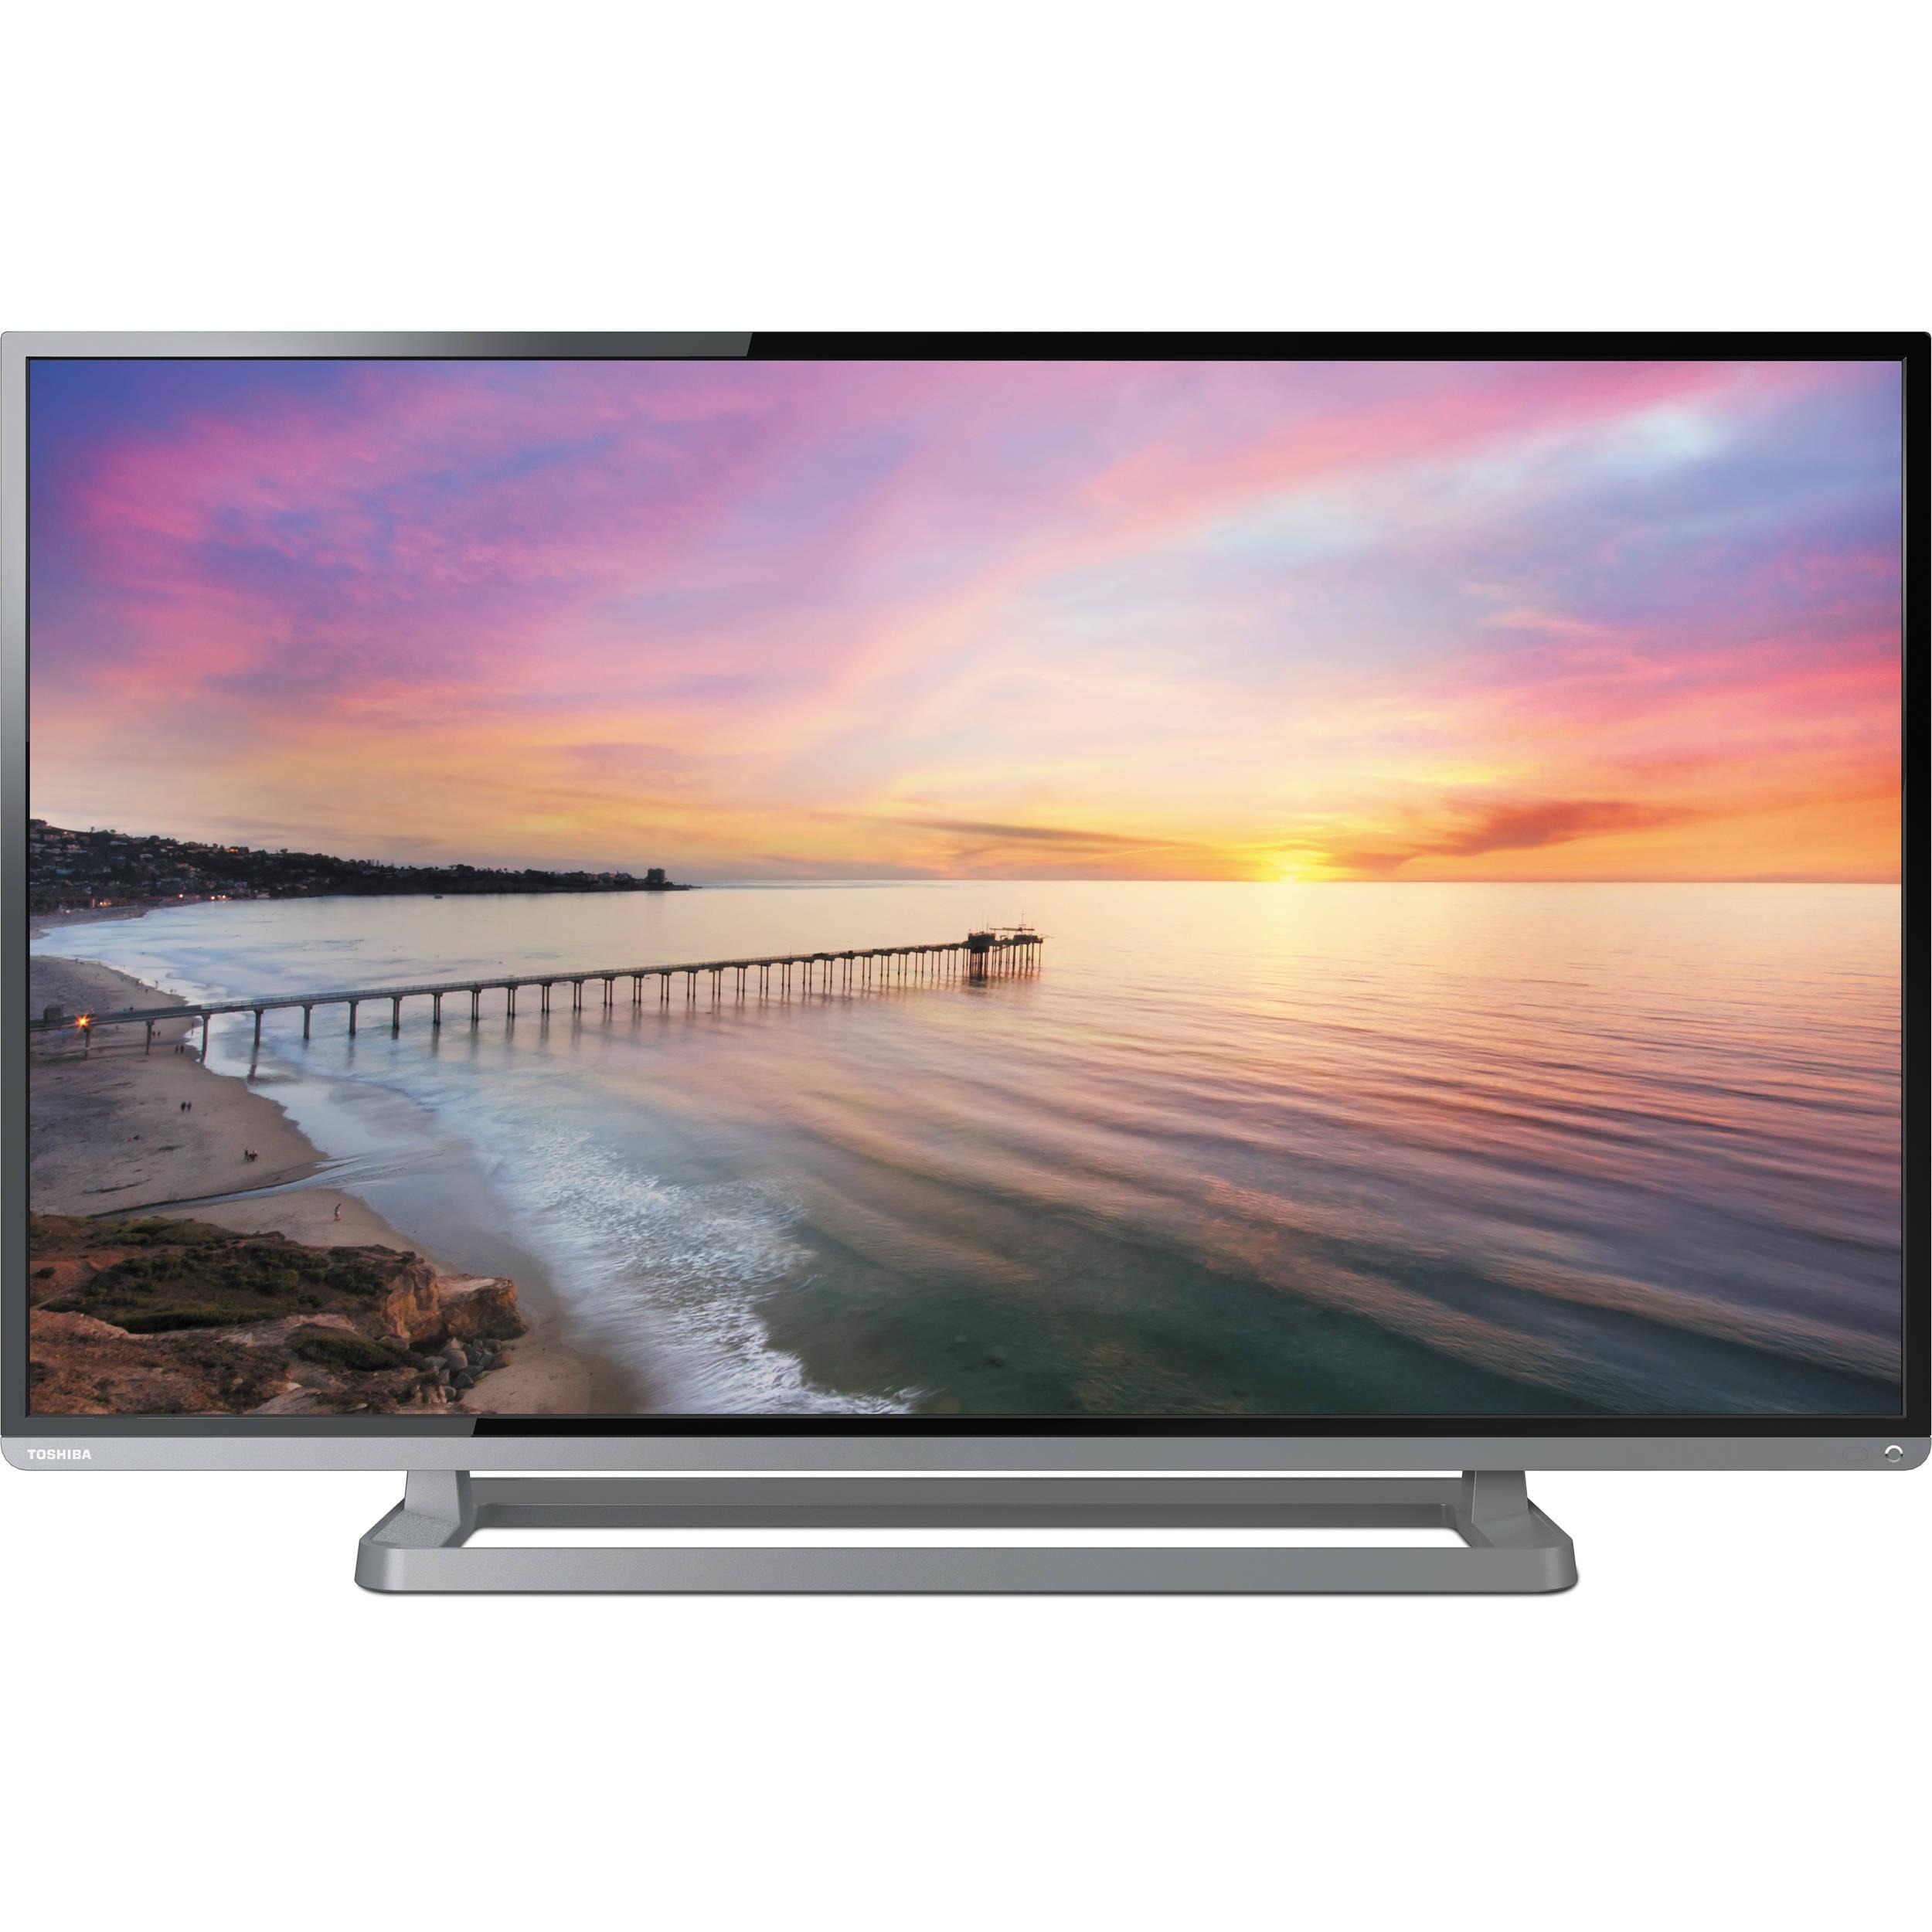 "Toshiba 50L3400U 50"" Class 1080P Smart LED TV"